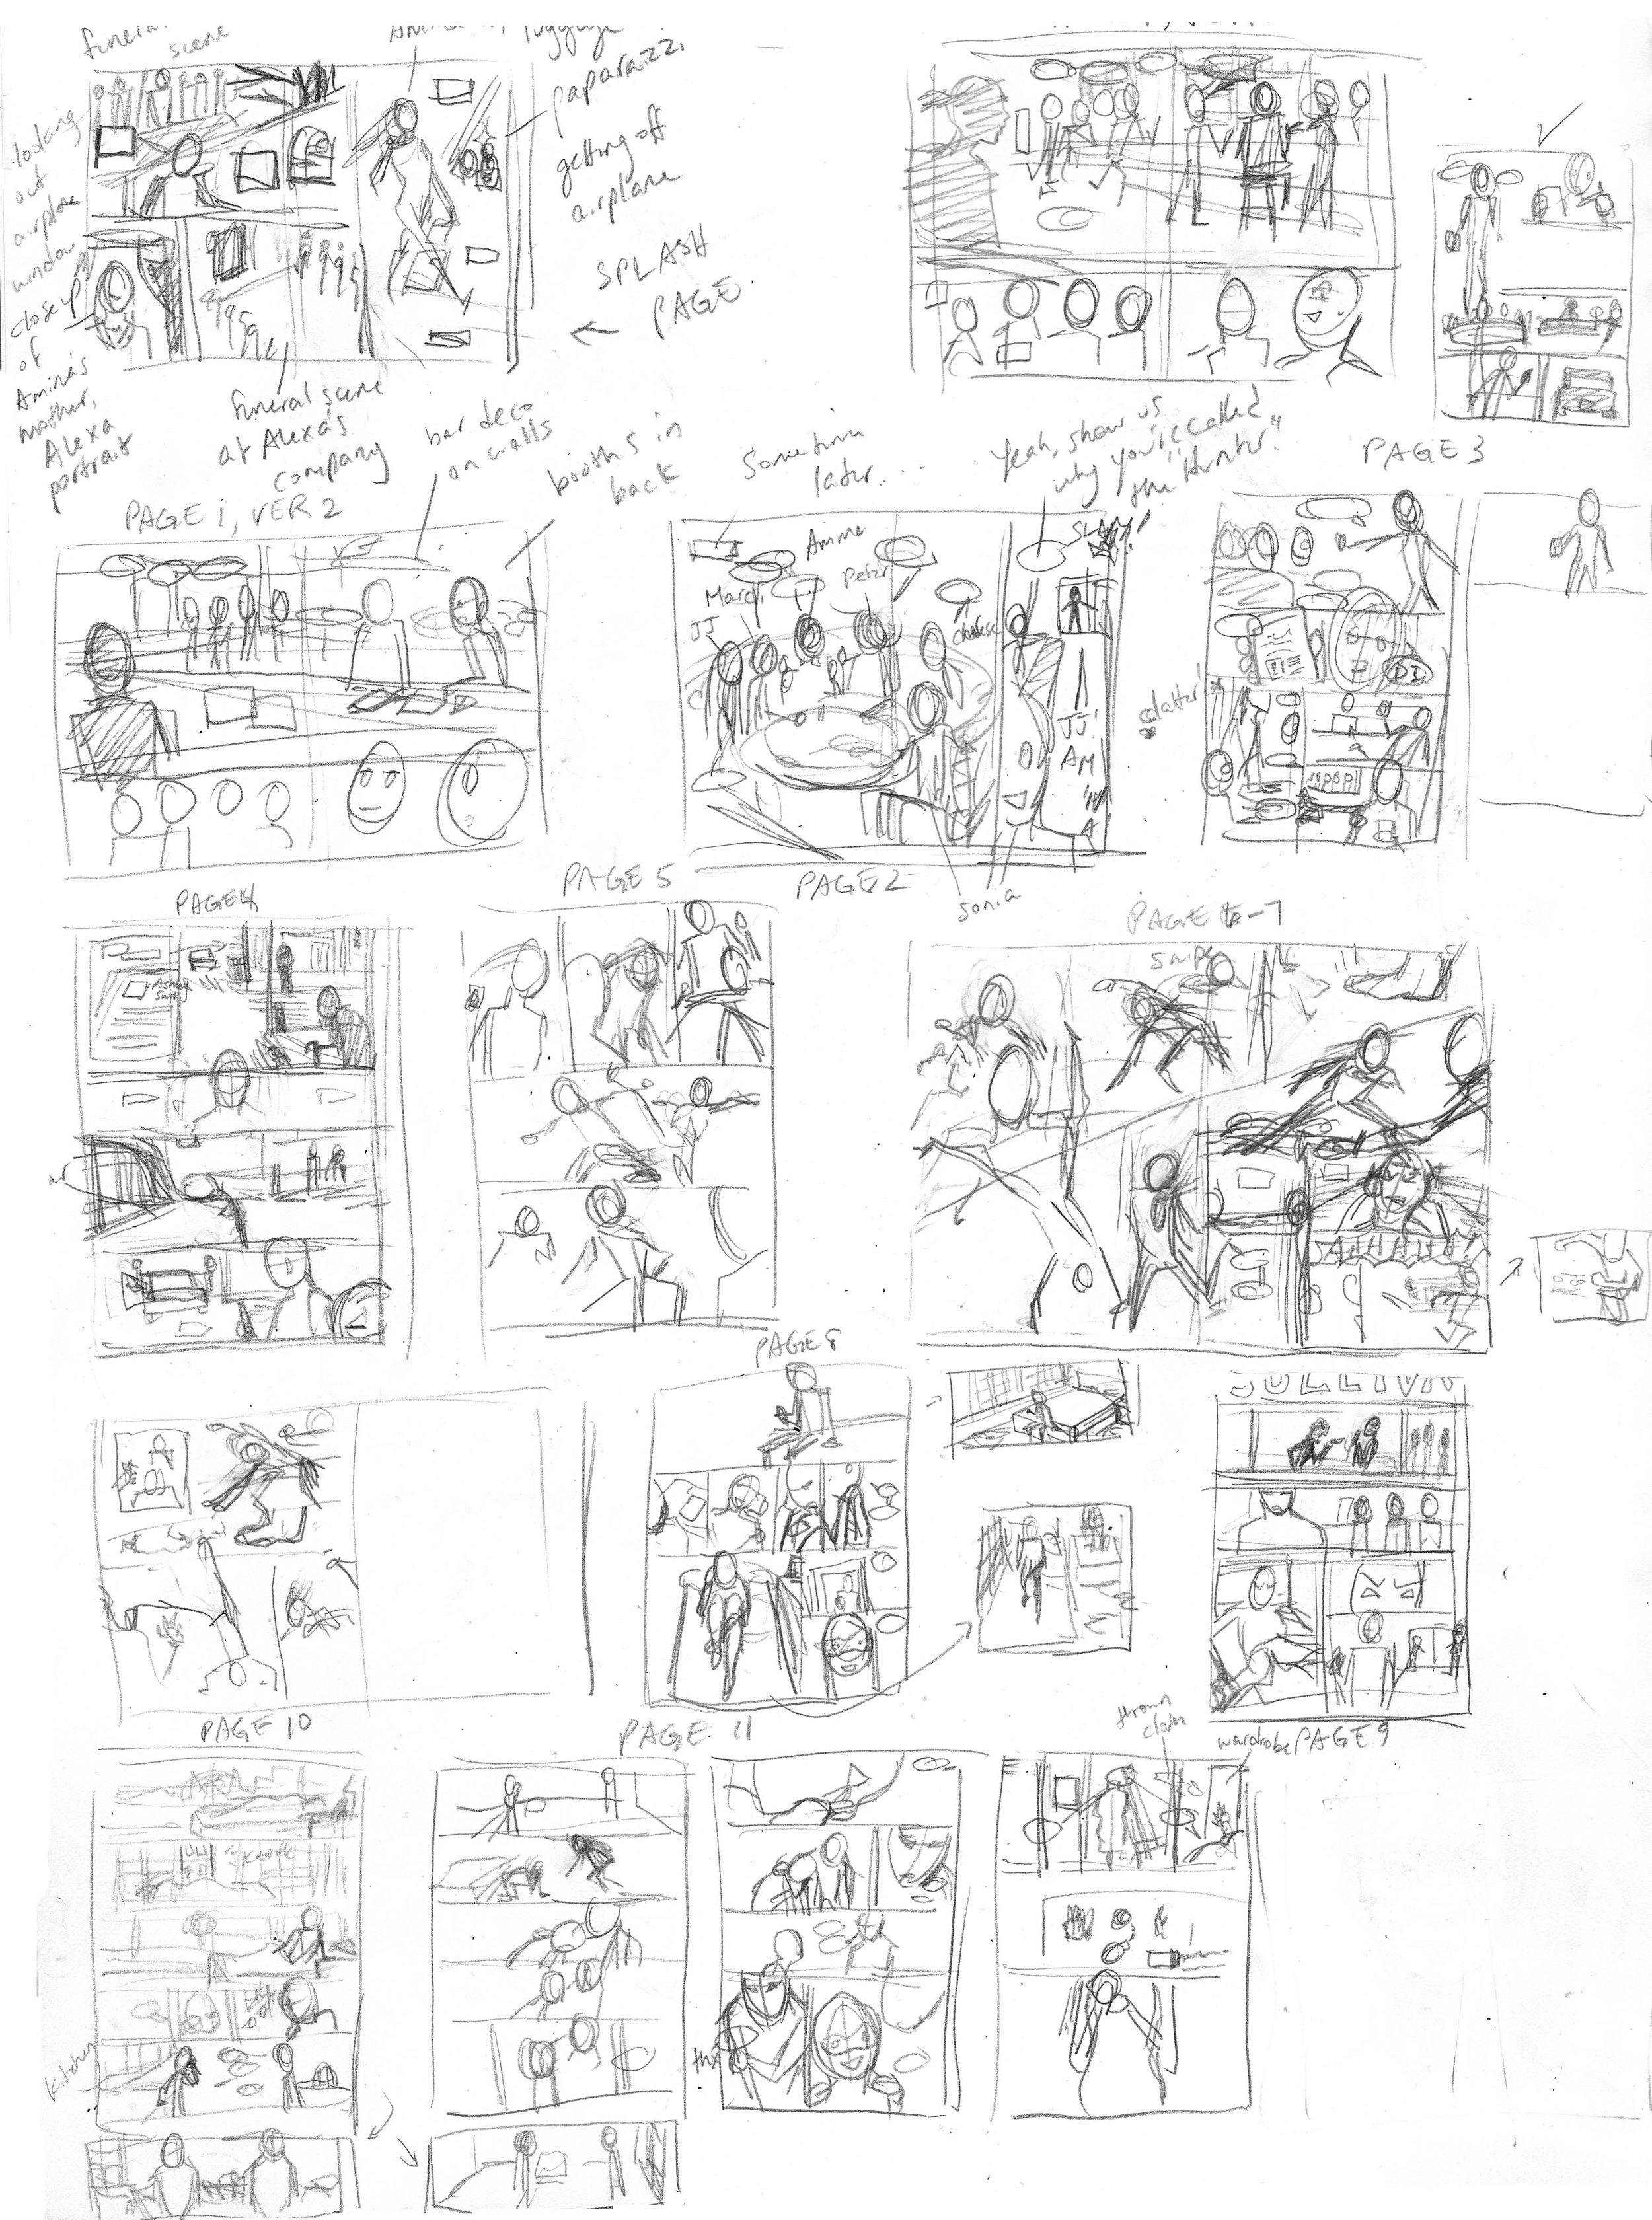 hunter haute_thumbnails sketch 1.jpg